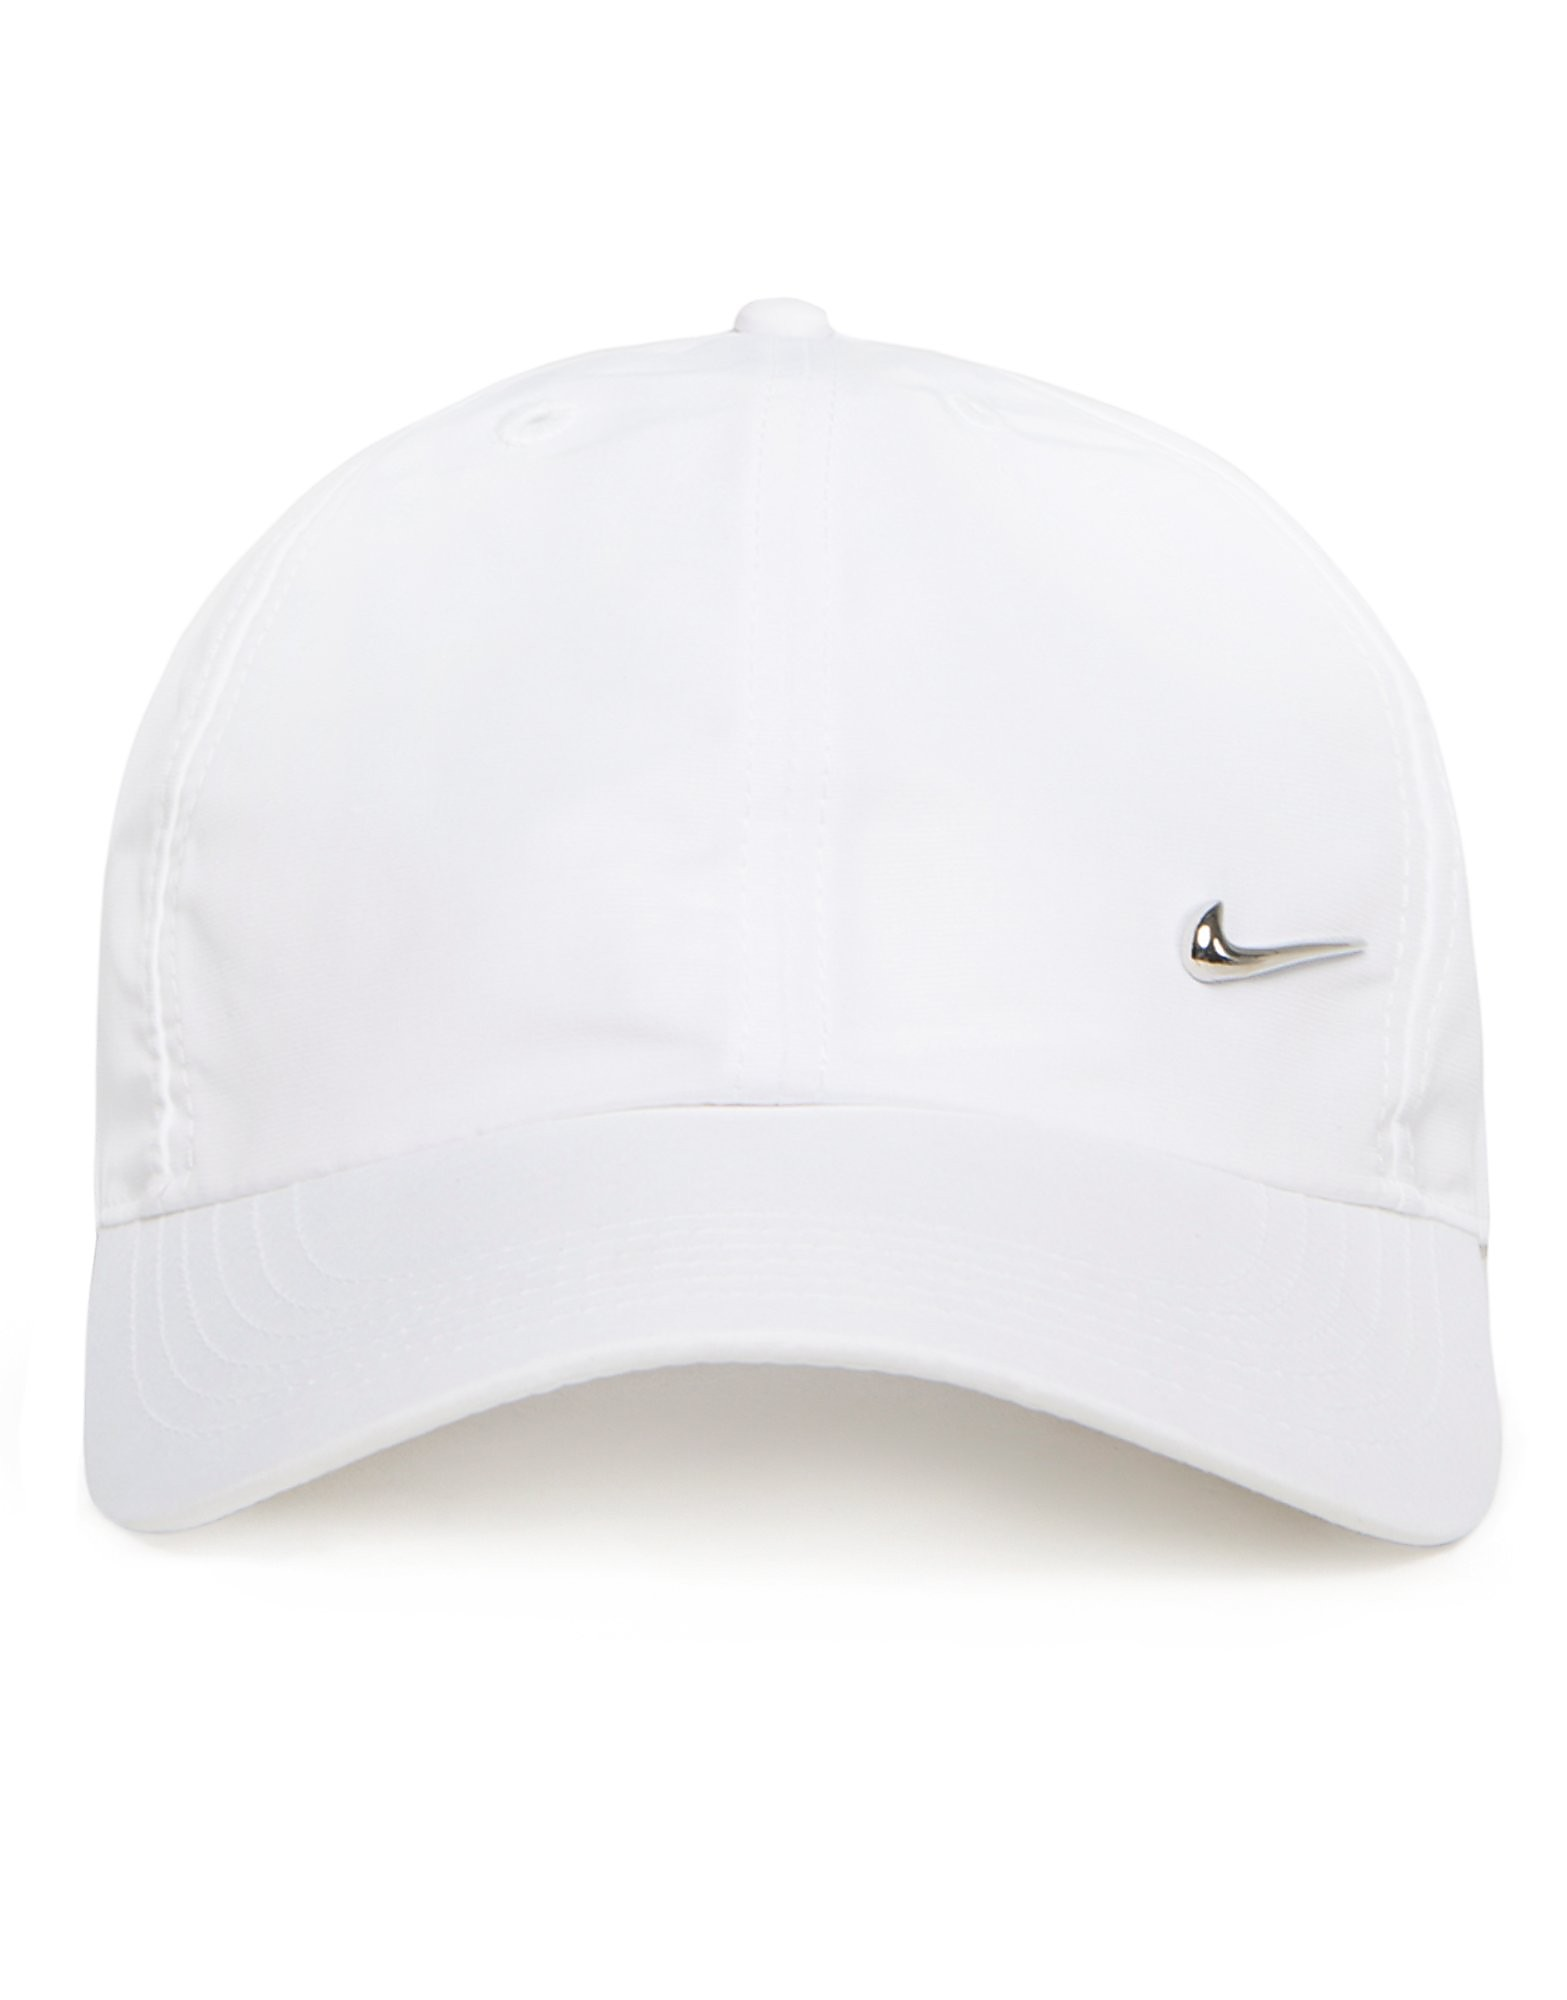 Nike Side Swoosh Cap Junior - White/Silver - Kids, White/Silver